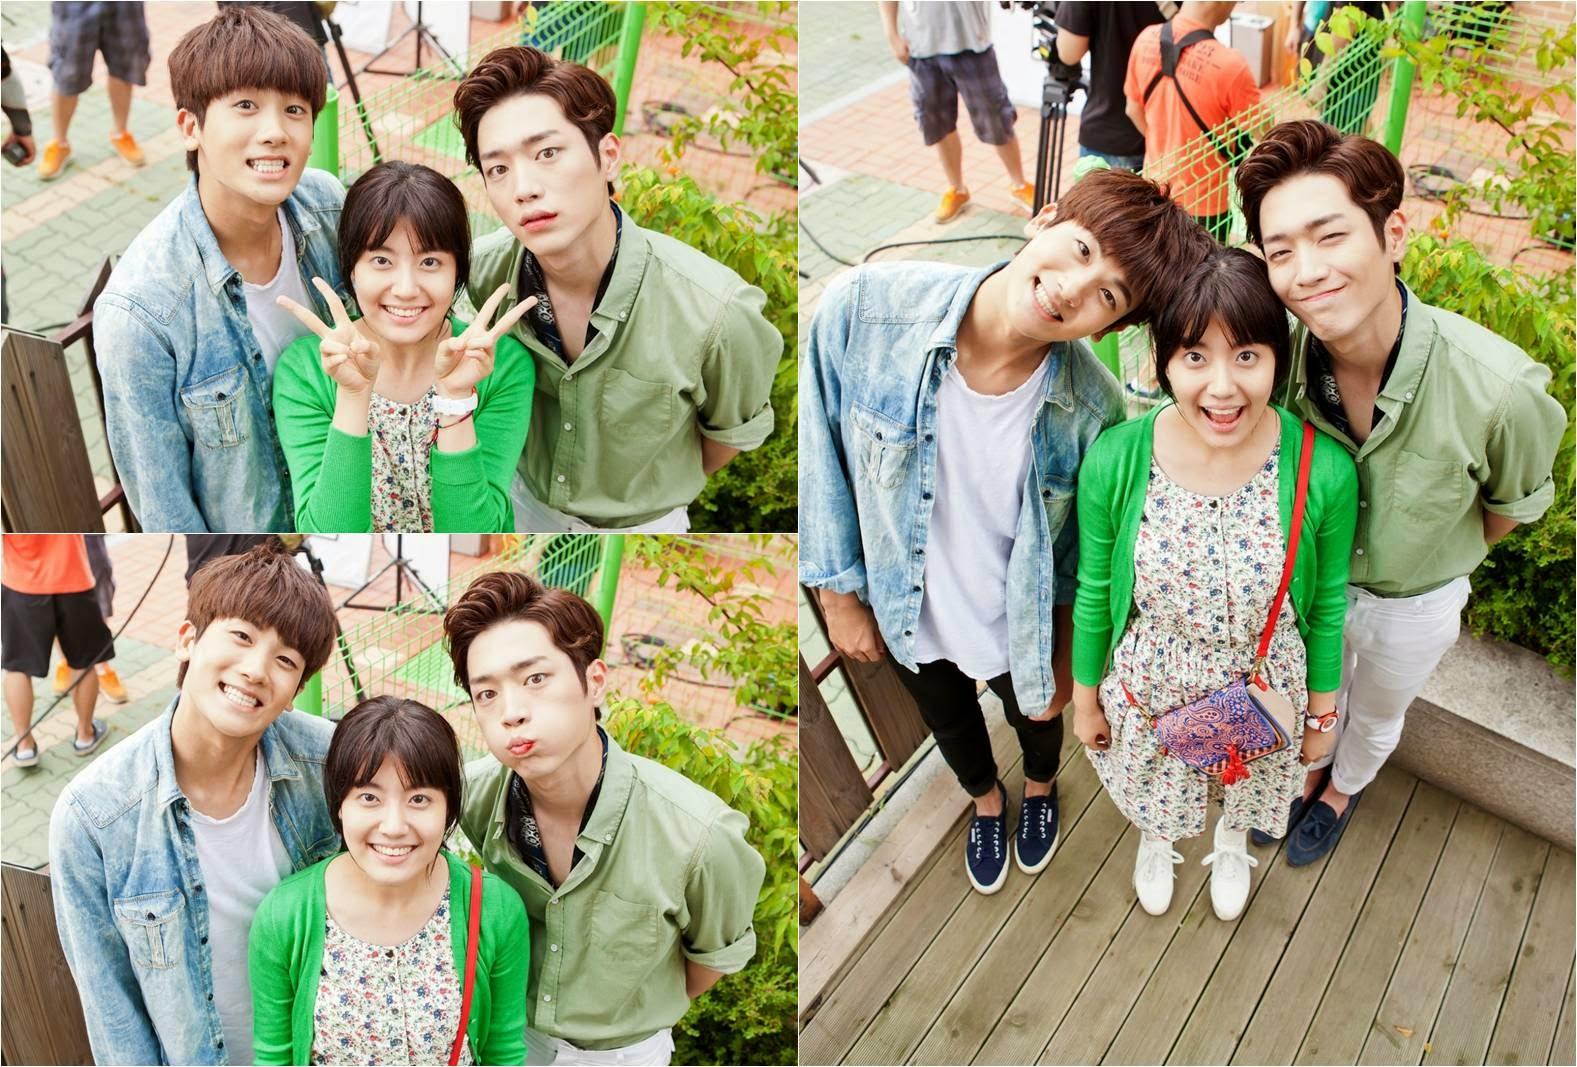 Nam ji hyun and park hyungsik dating sim